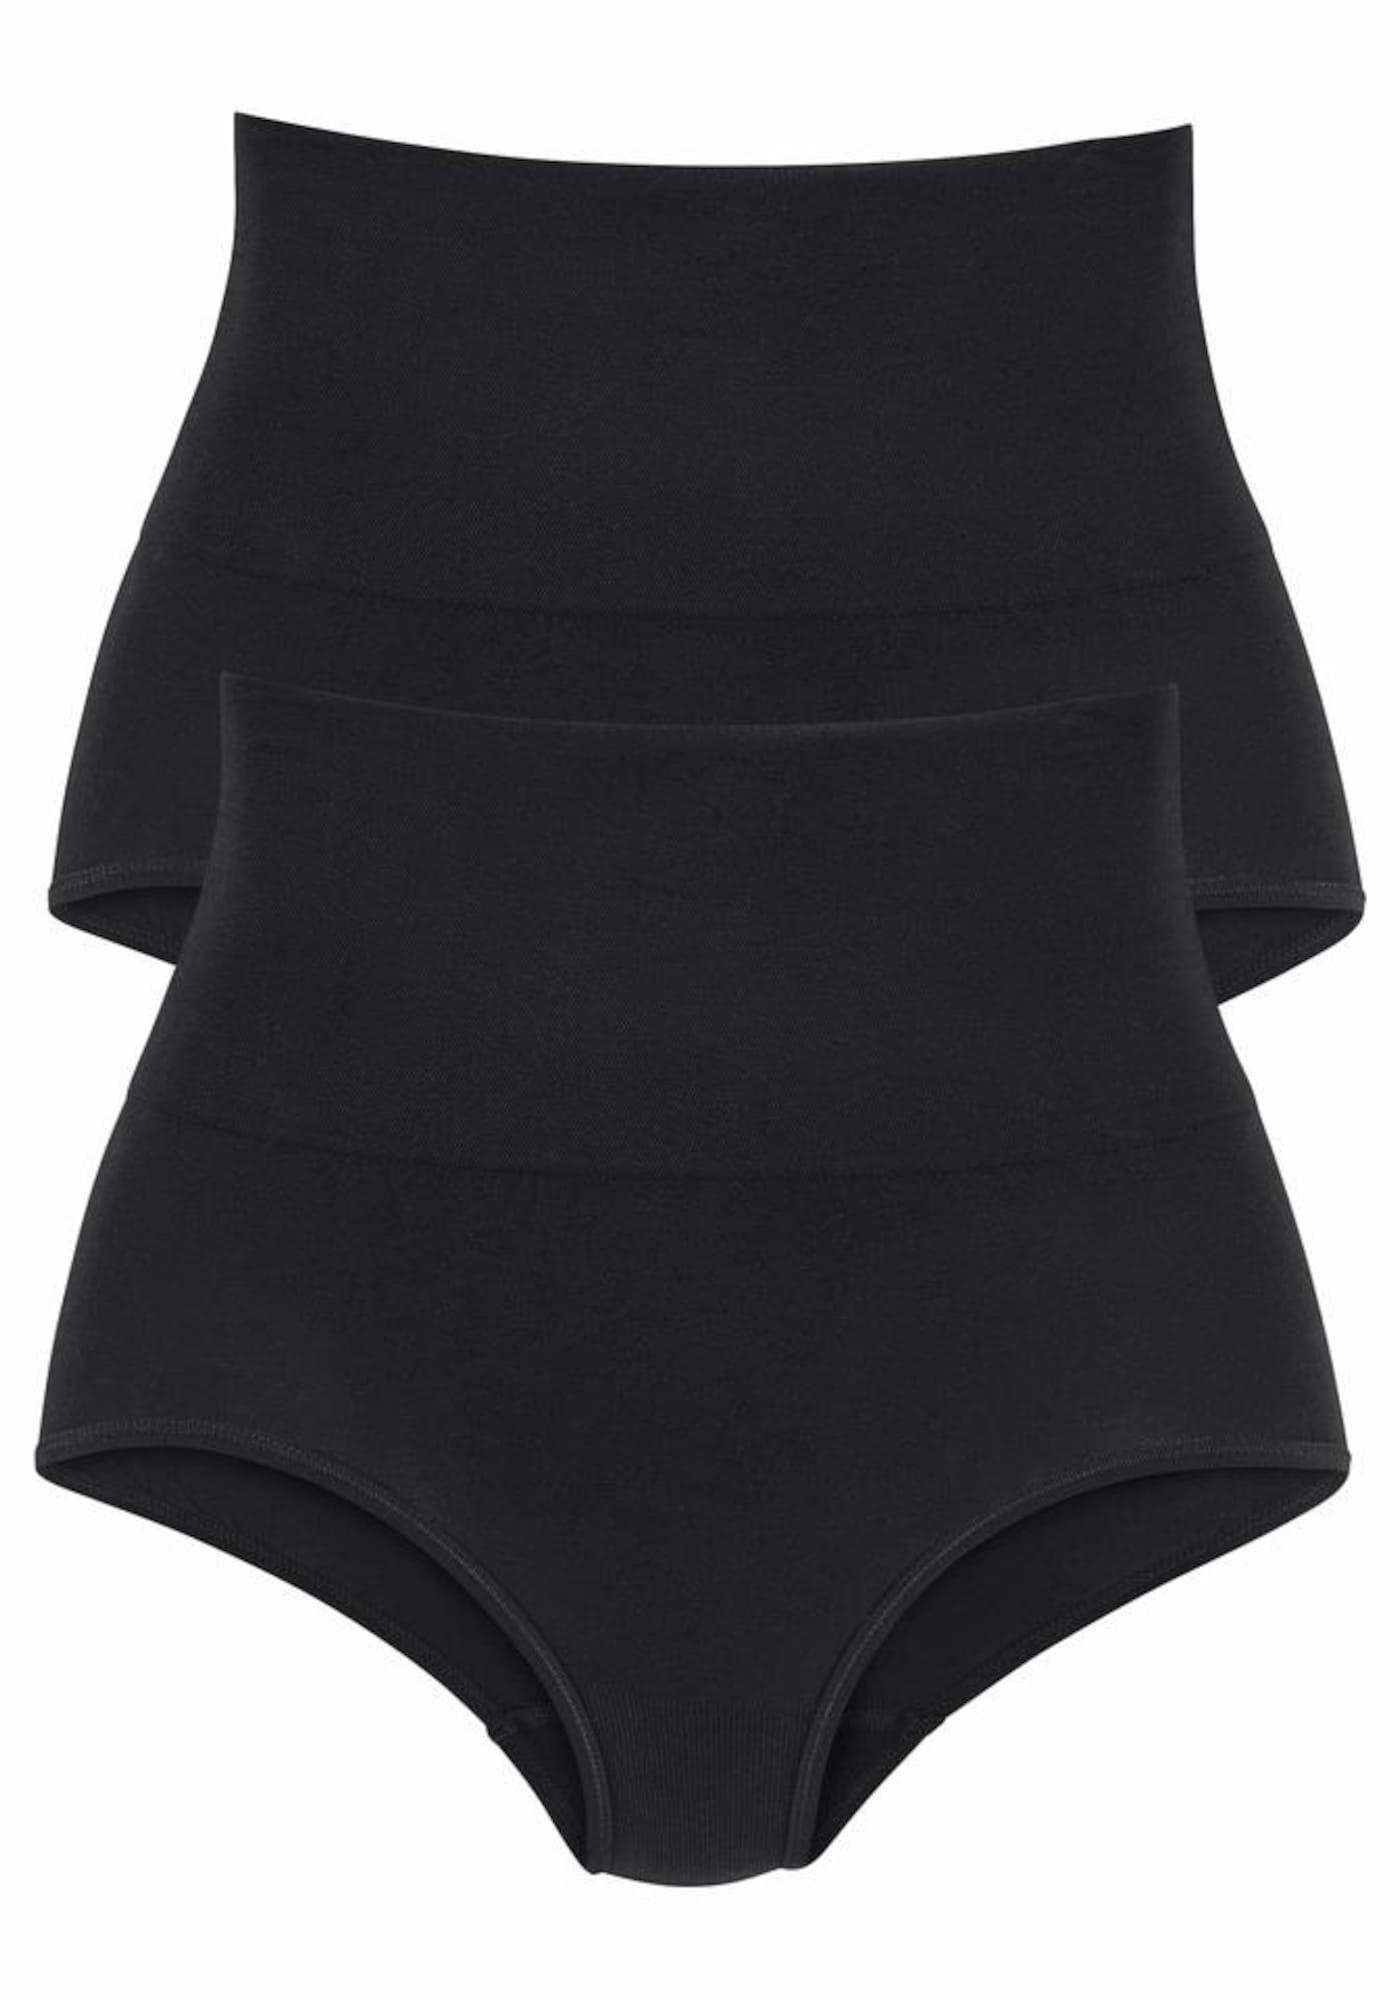 PETITE FLEUR Stahovací prádlo  černá